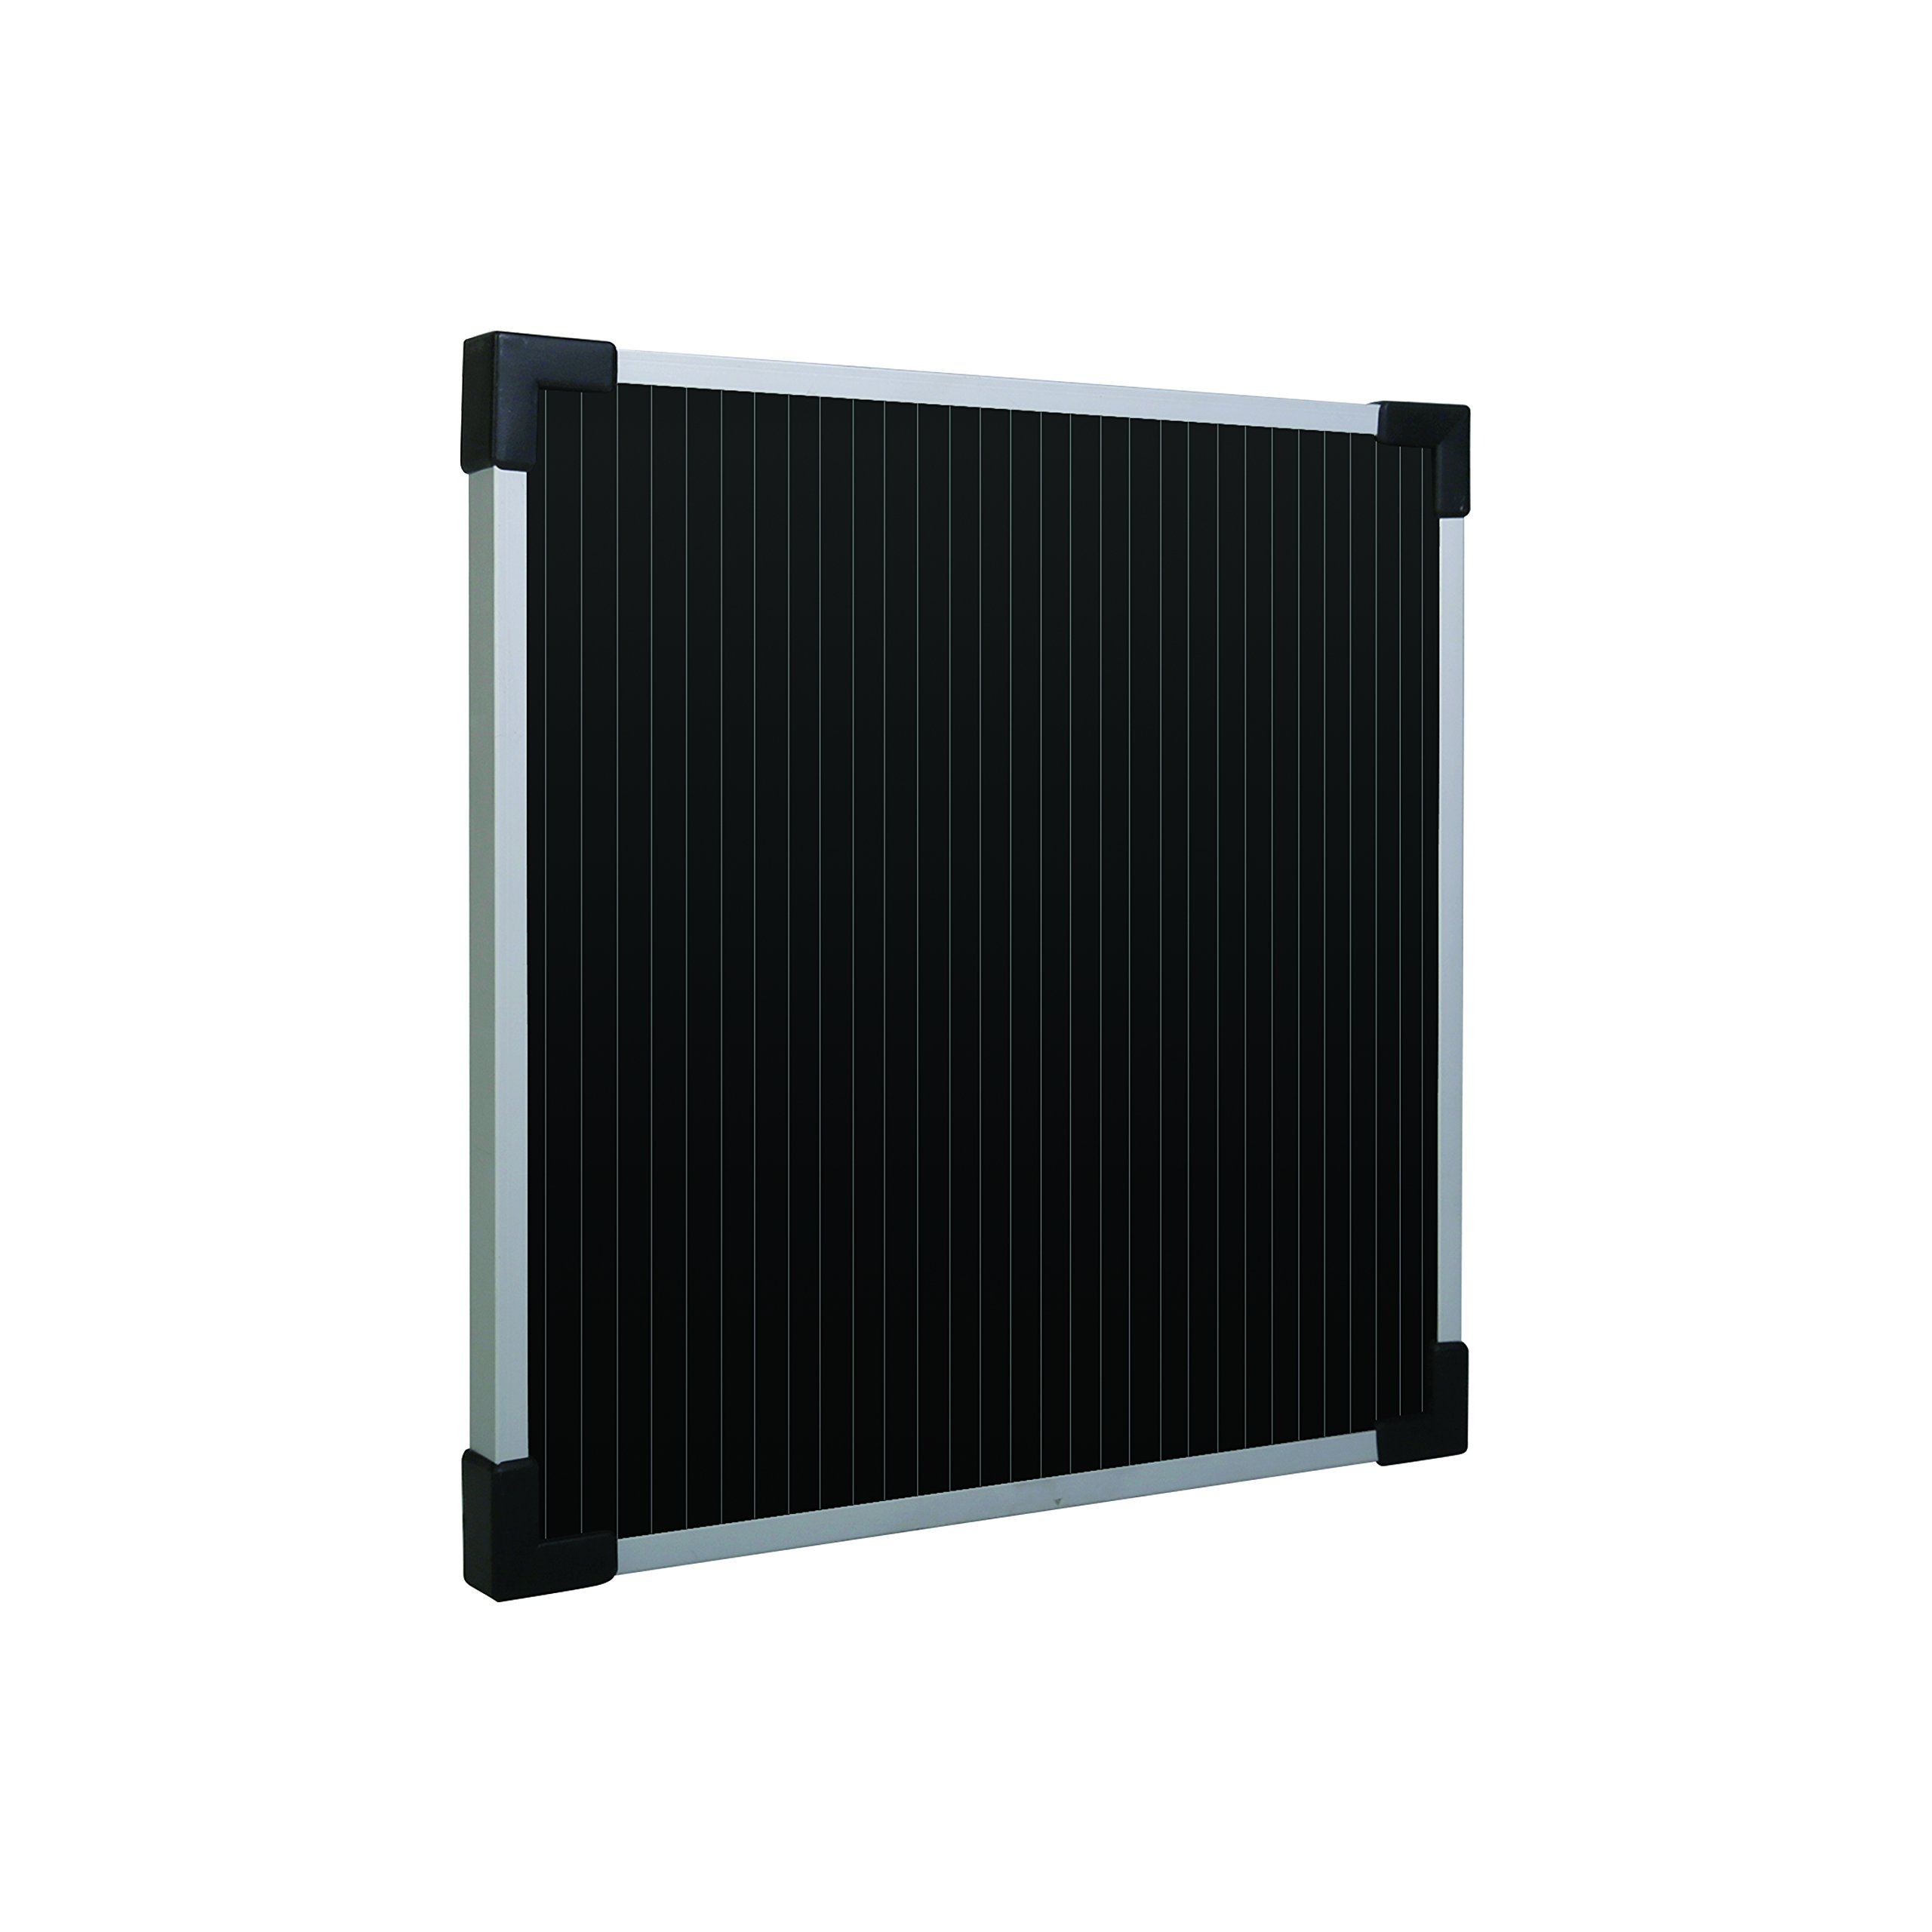 Sunforce 50022 5-Watt Solar Battery Trickle Charger by Sunforce (Image #3)